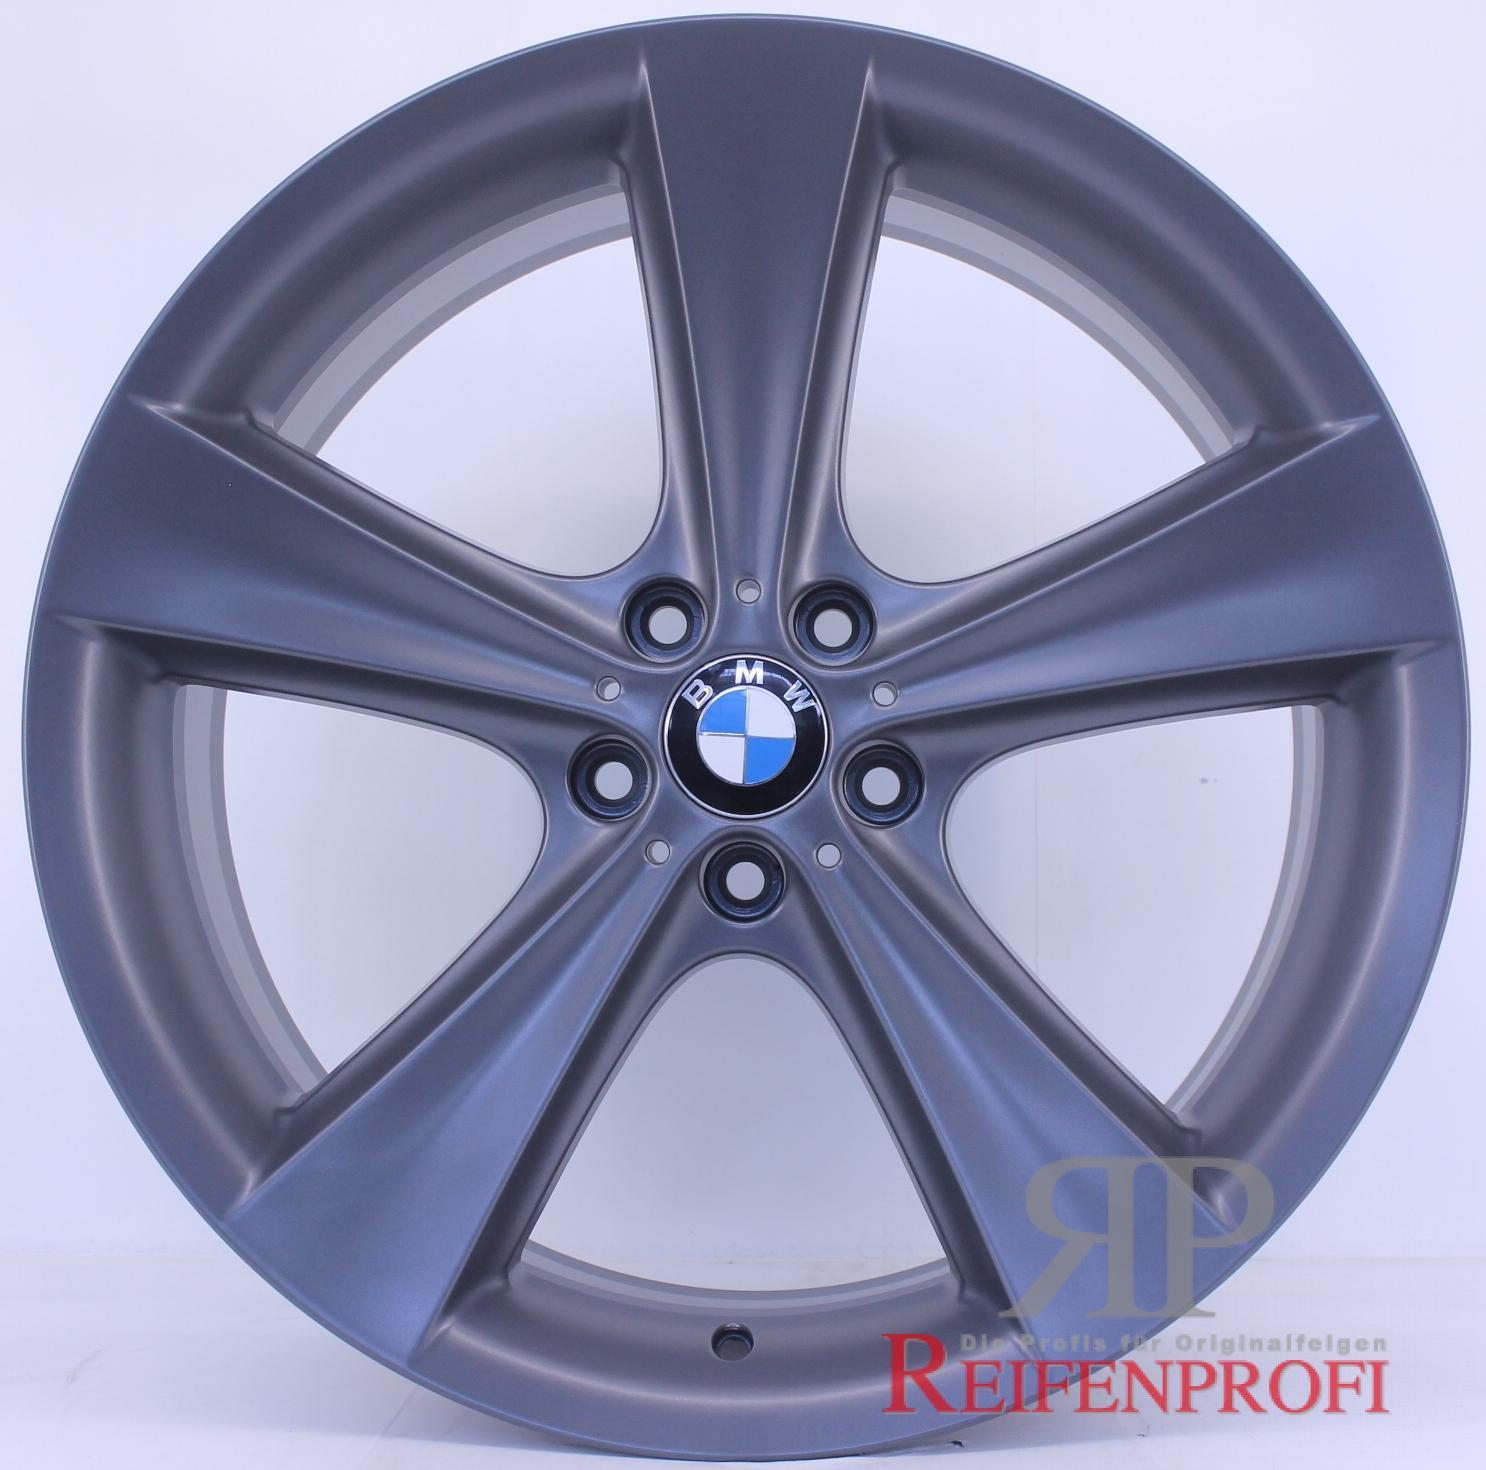 Bmw X6 Styling: Original BMW X6 E71 F16 M Felgen Styling 128 10Jx21ET40 11